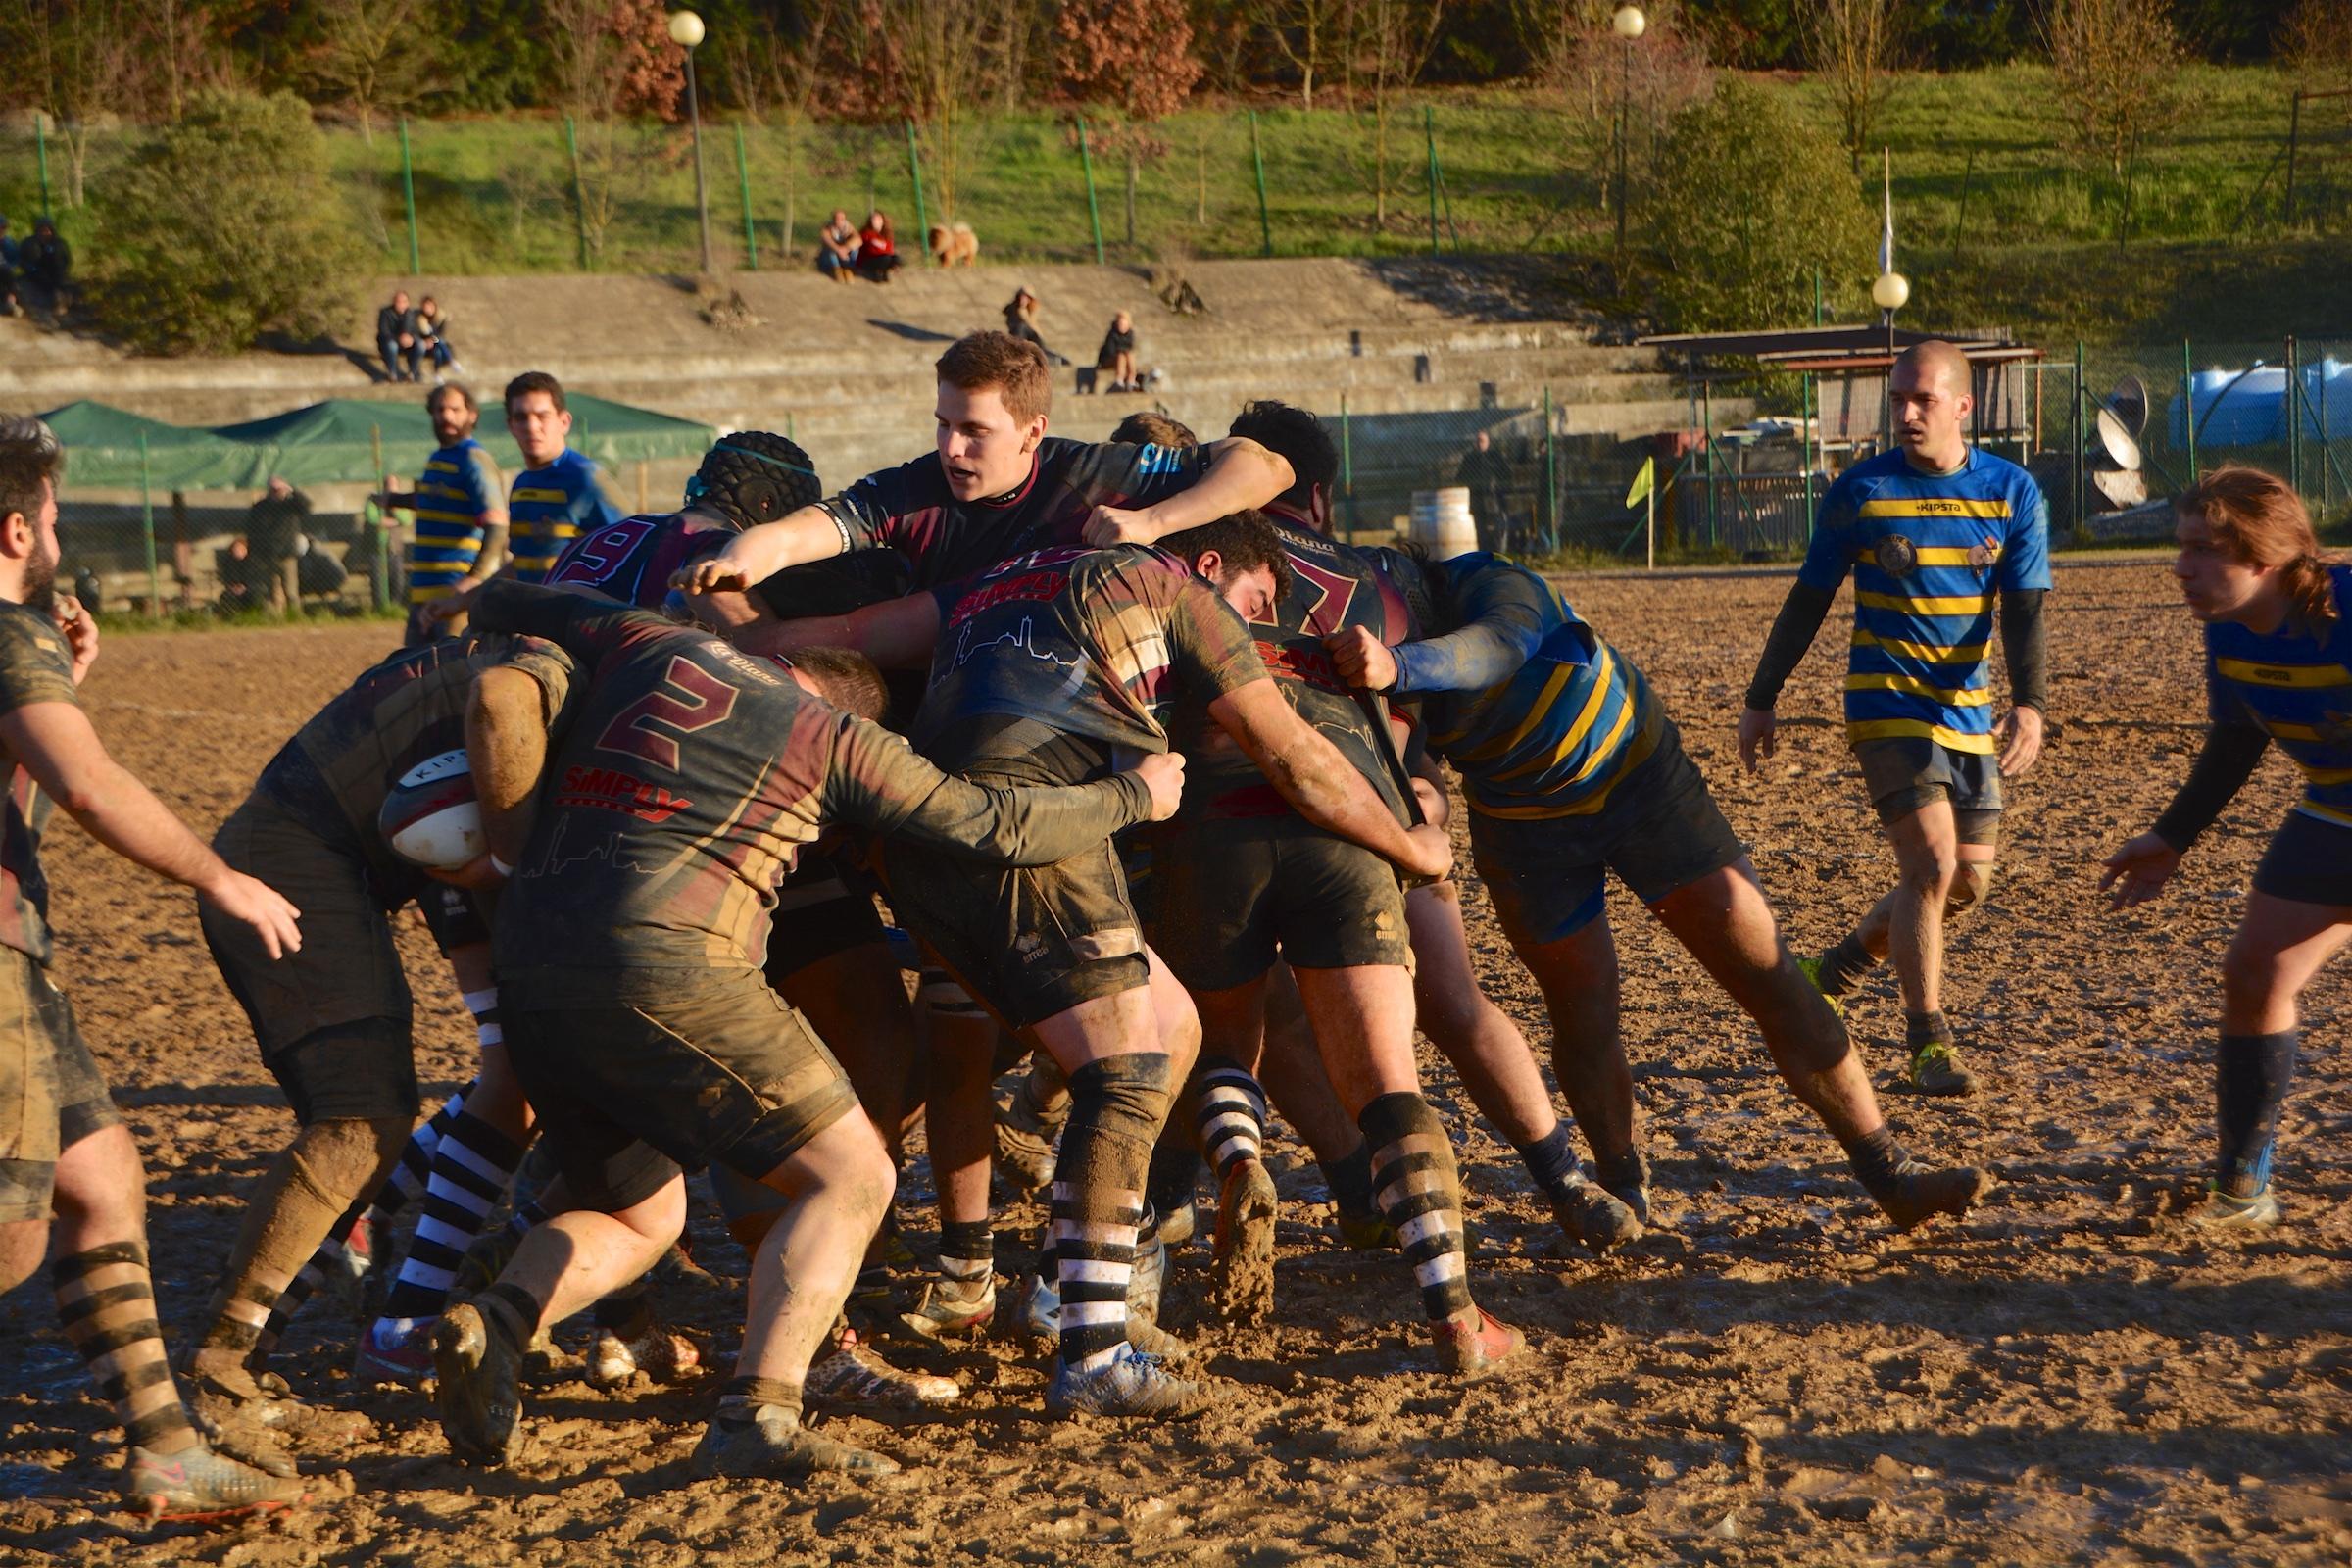 Banca CRAS CUS Siena Rugby continua la cavalcata in solitaria…